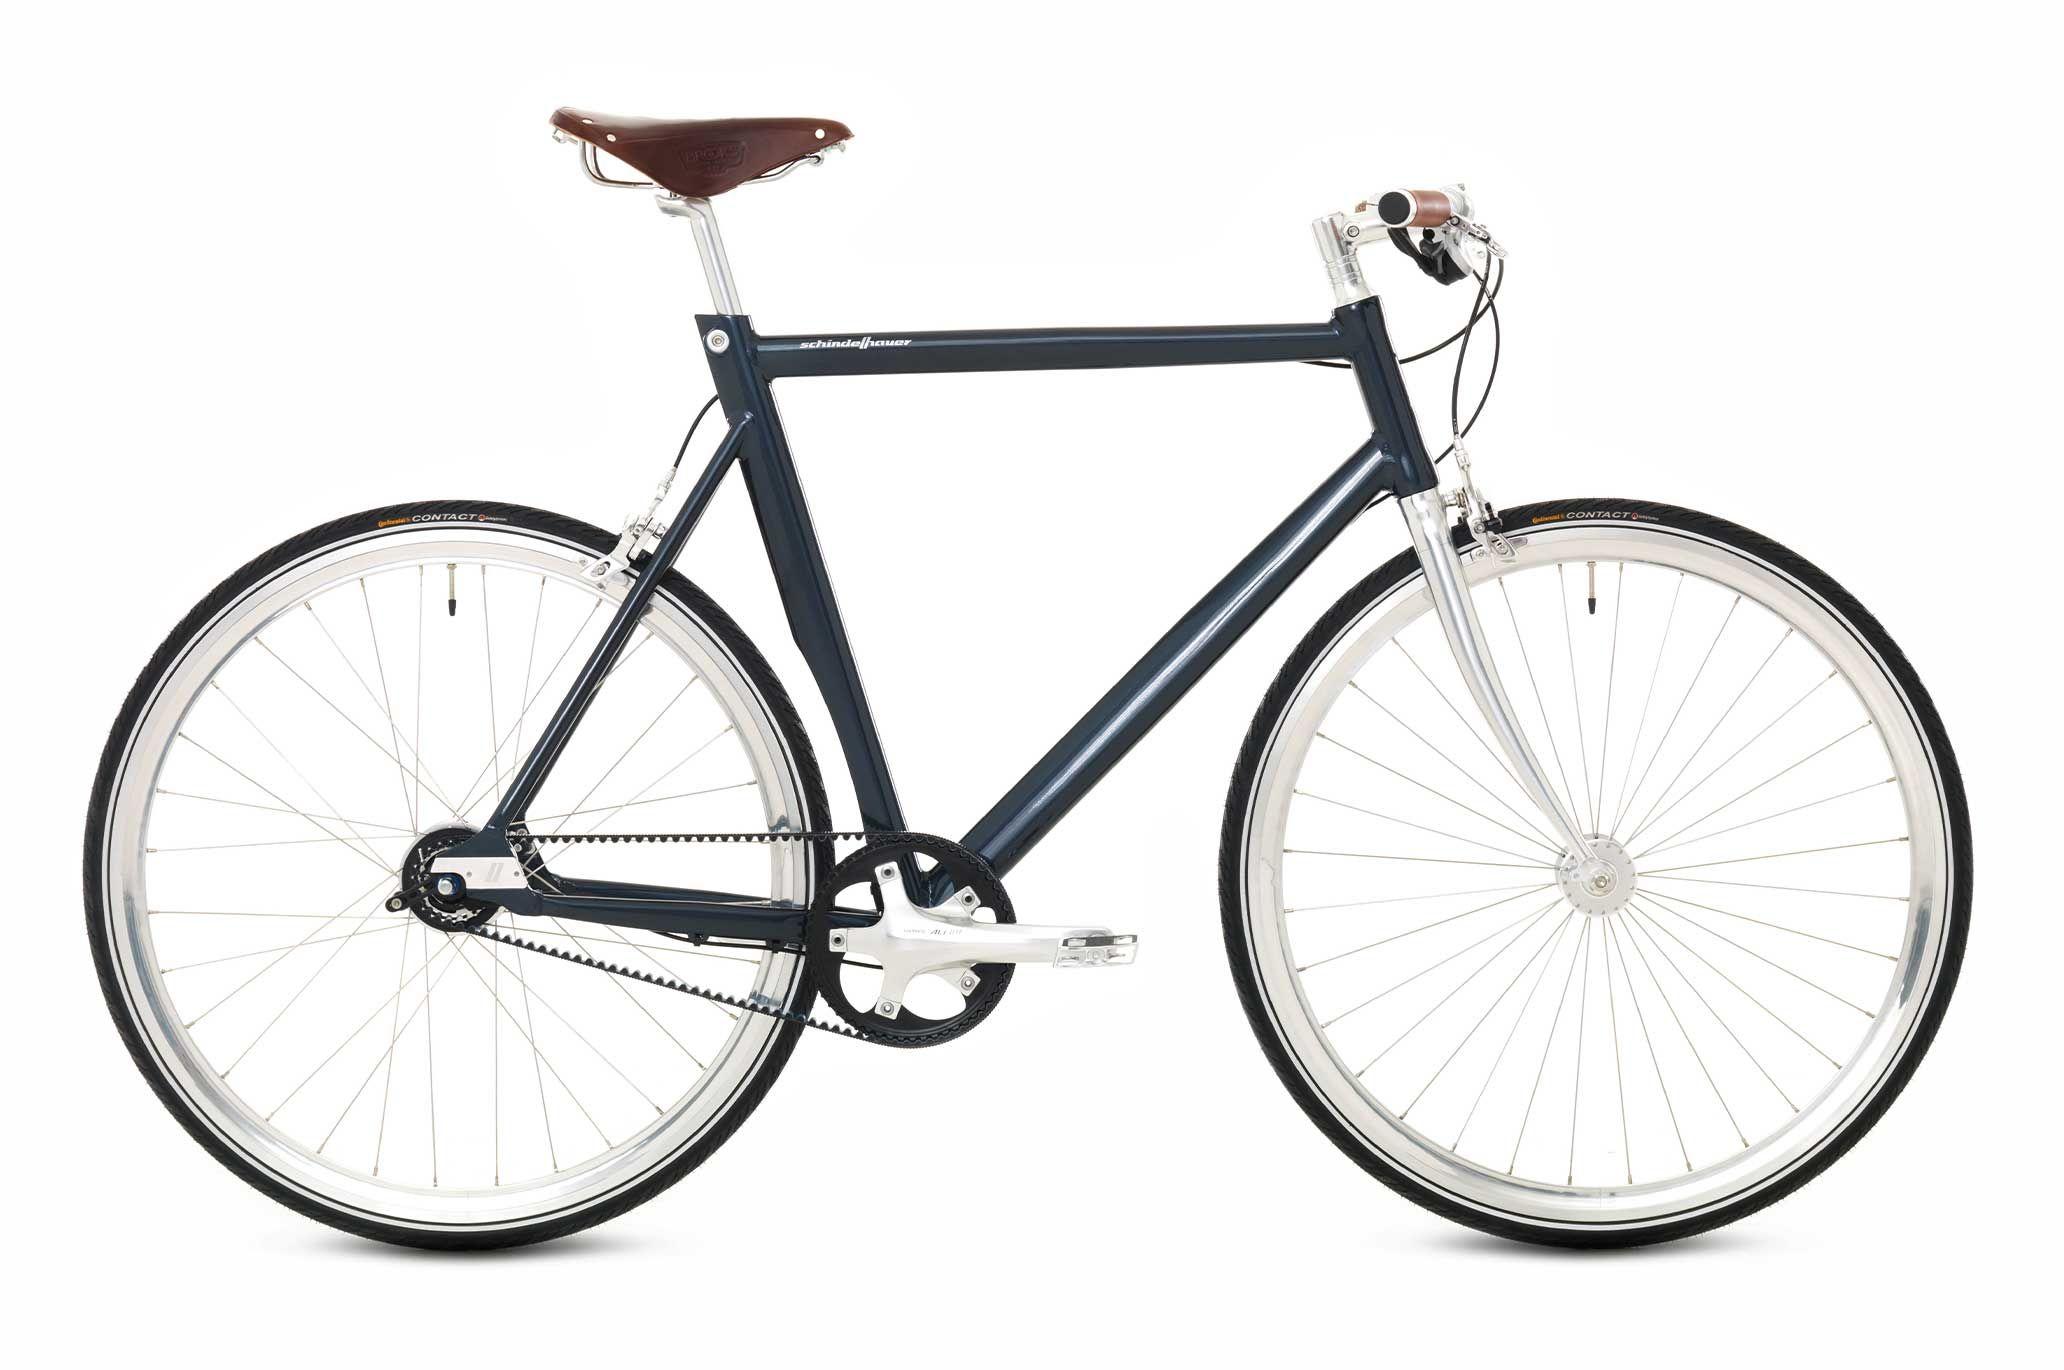 Http Www Schindelhauerbikes Com En Bikes Ludwig Html With